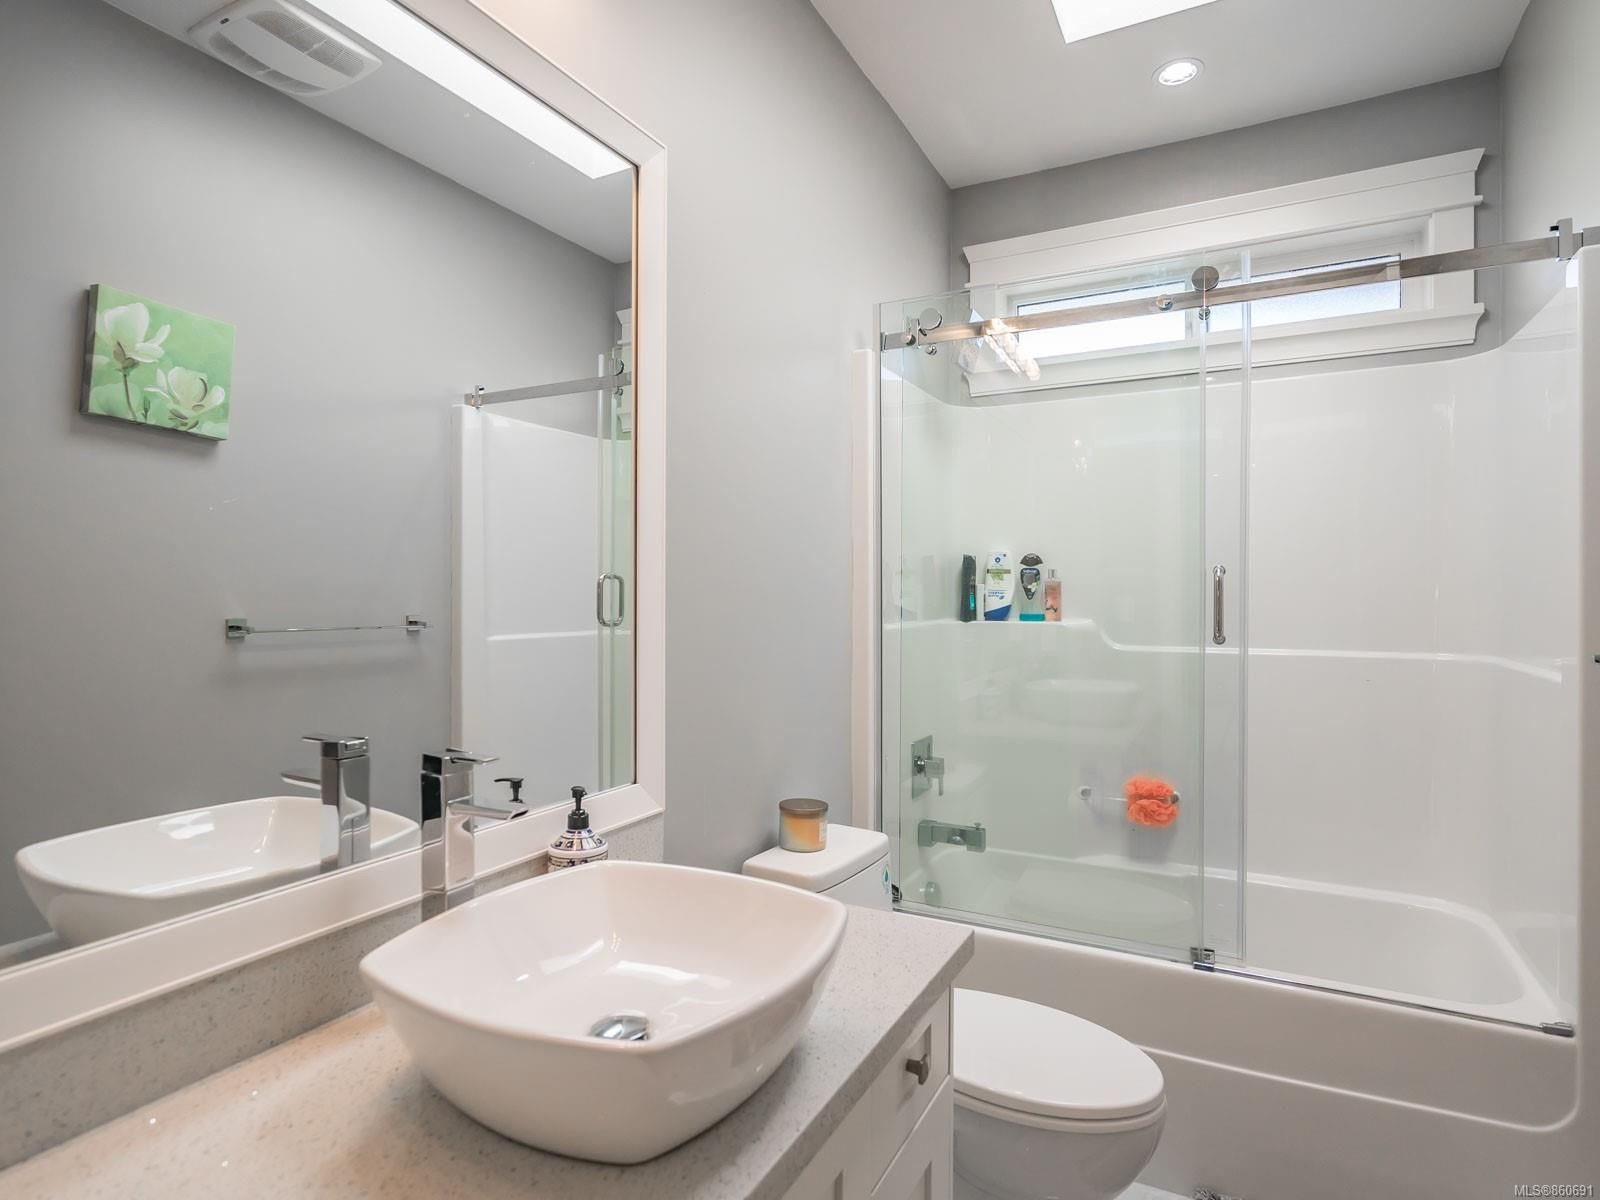 Photo 39: Photos: 5821 Linley Valley Dr in : Na North Nanaimo House for sale (Nanaimo)  : MLS®# 860691